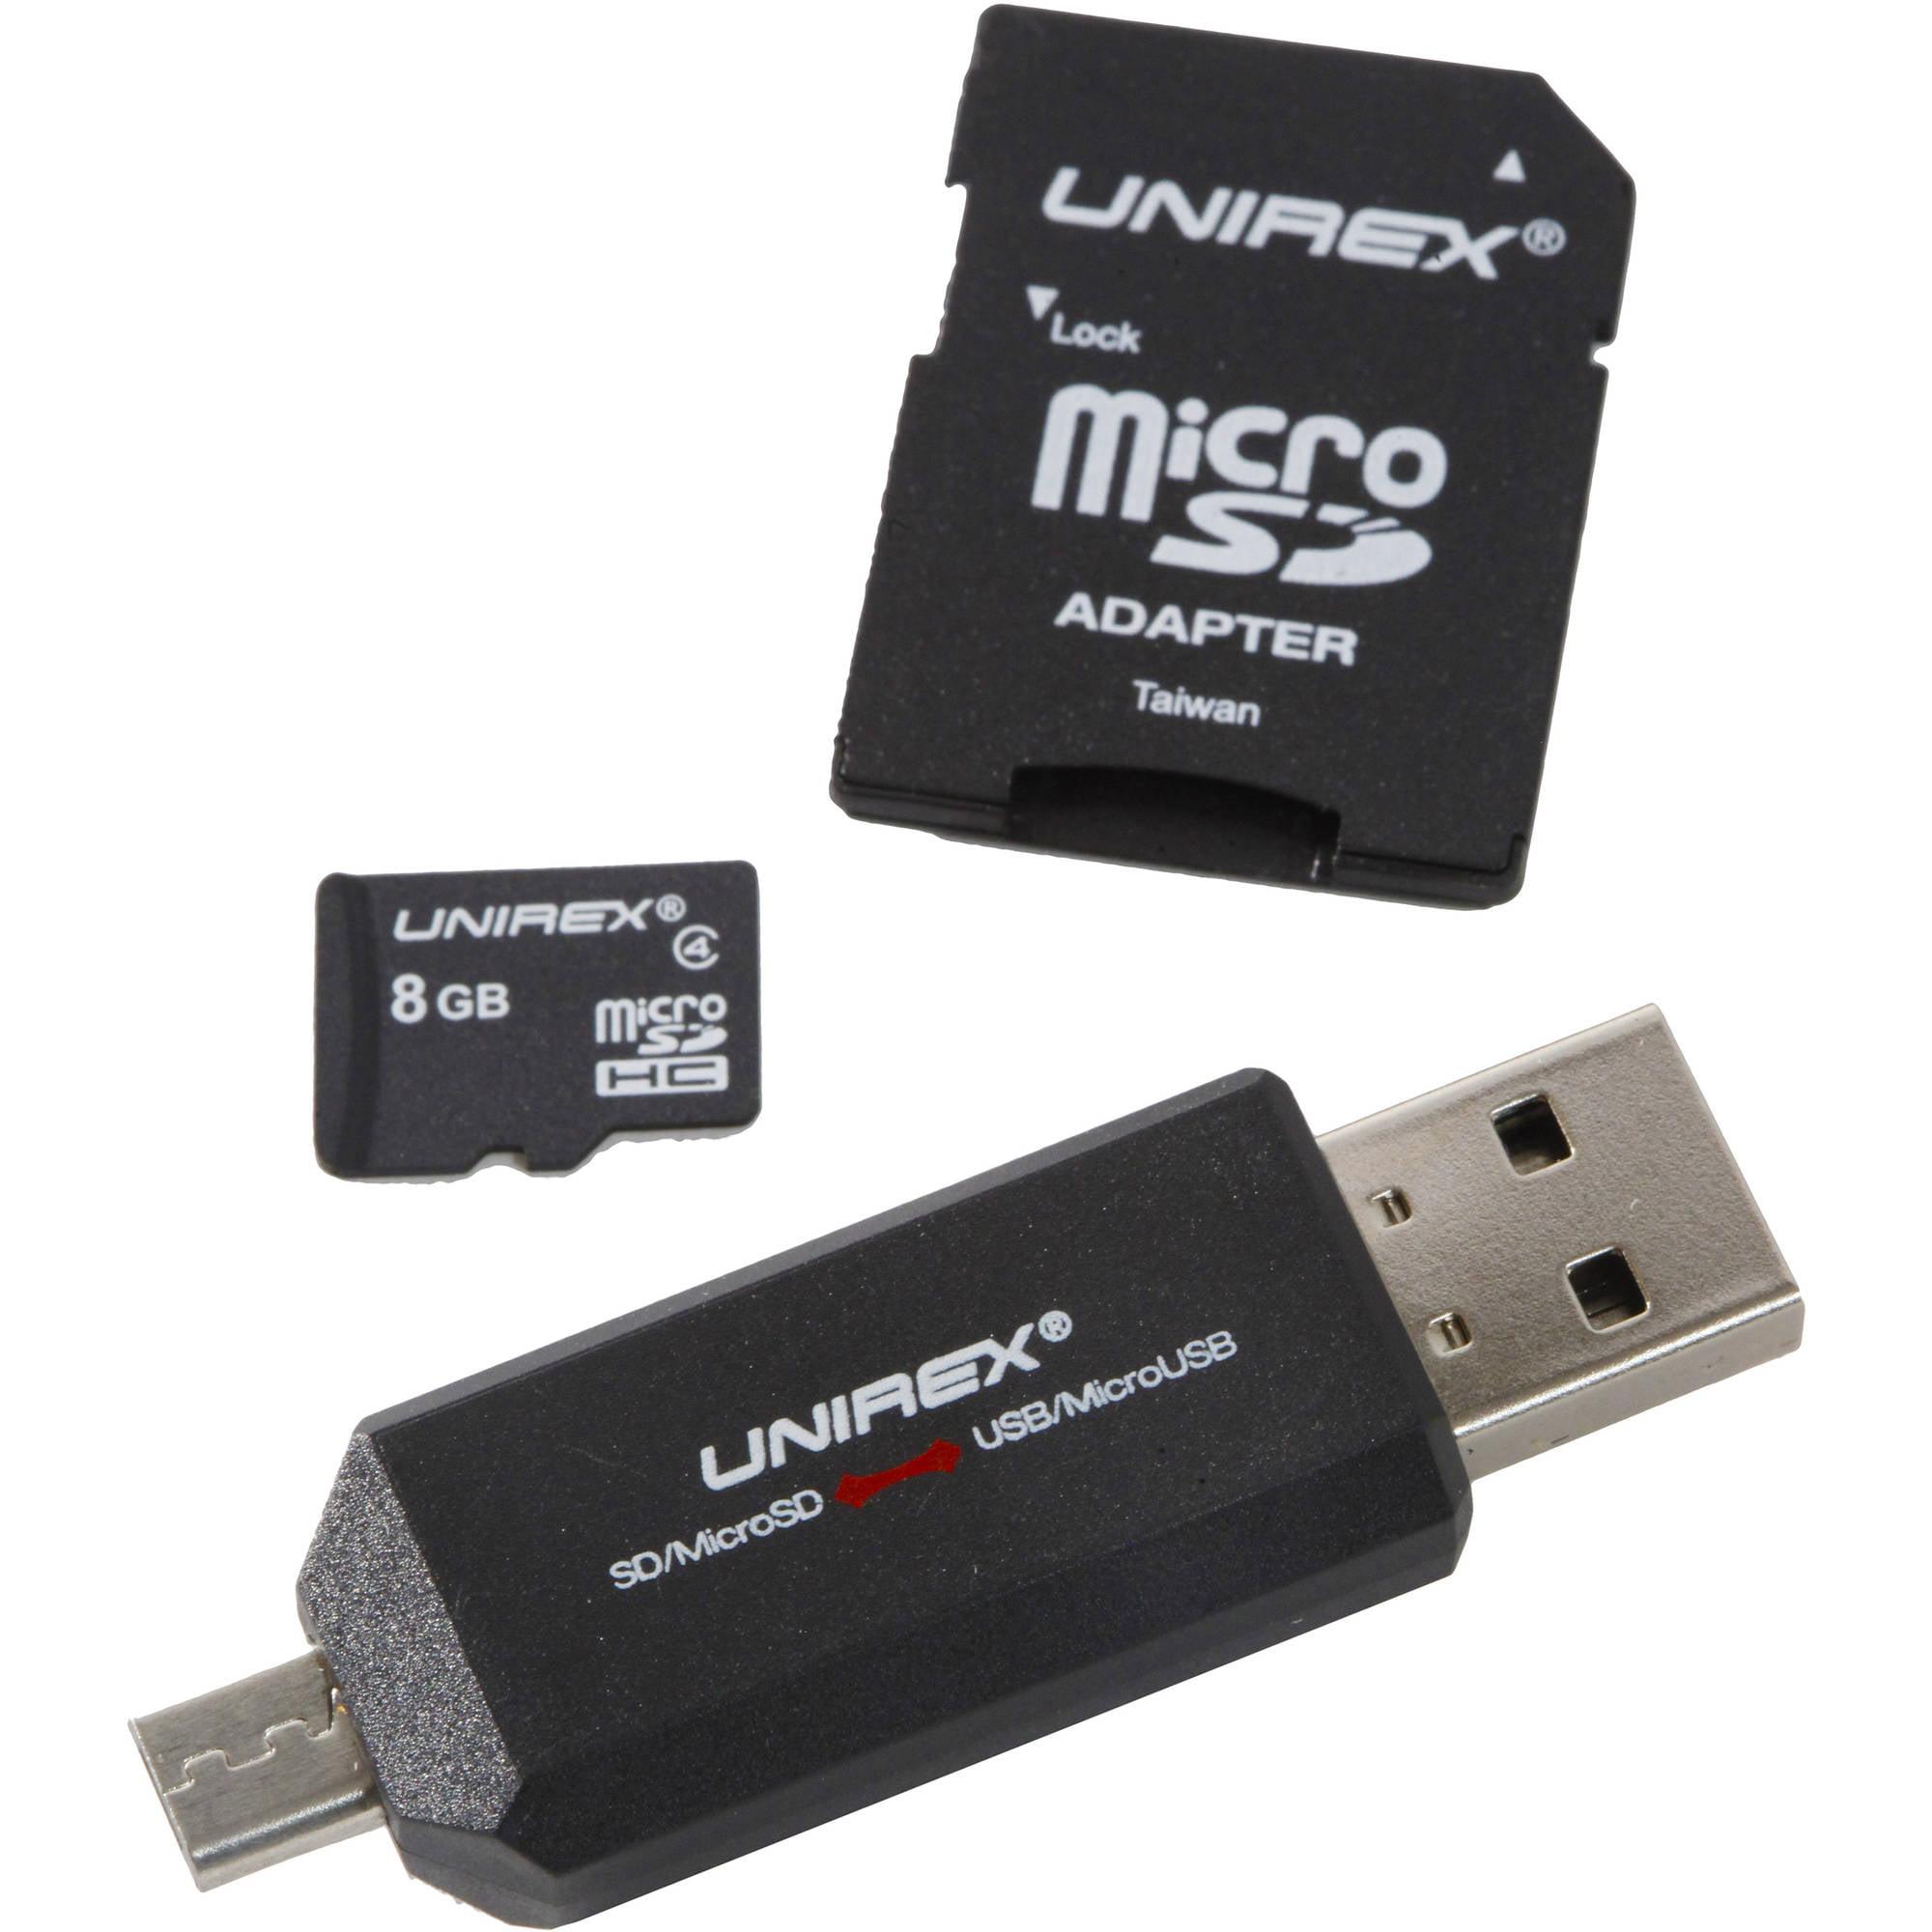 Unirex microSD 8GB Class 4 with USB/microUSB Reader